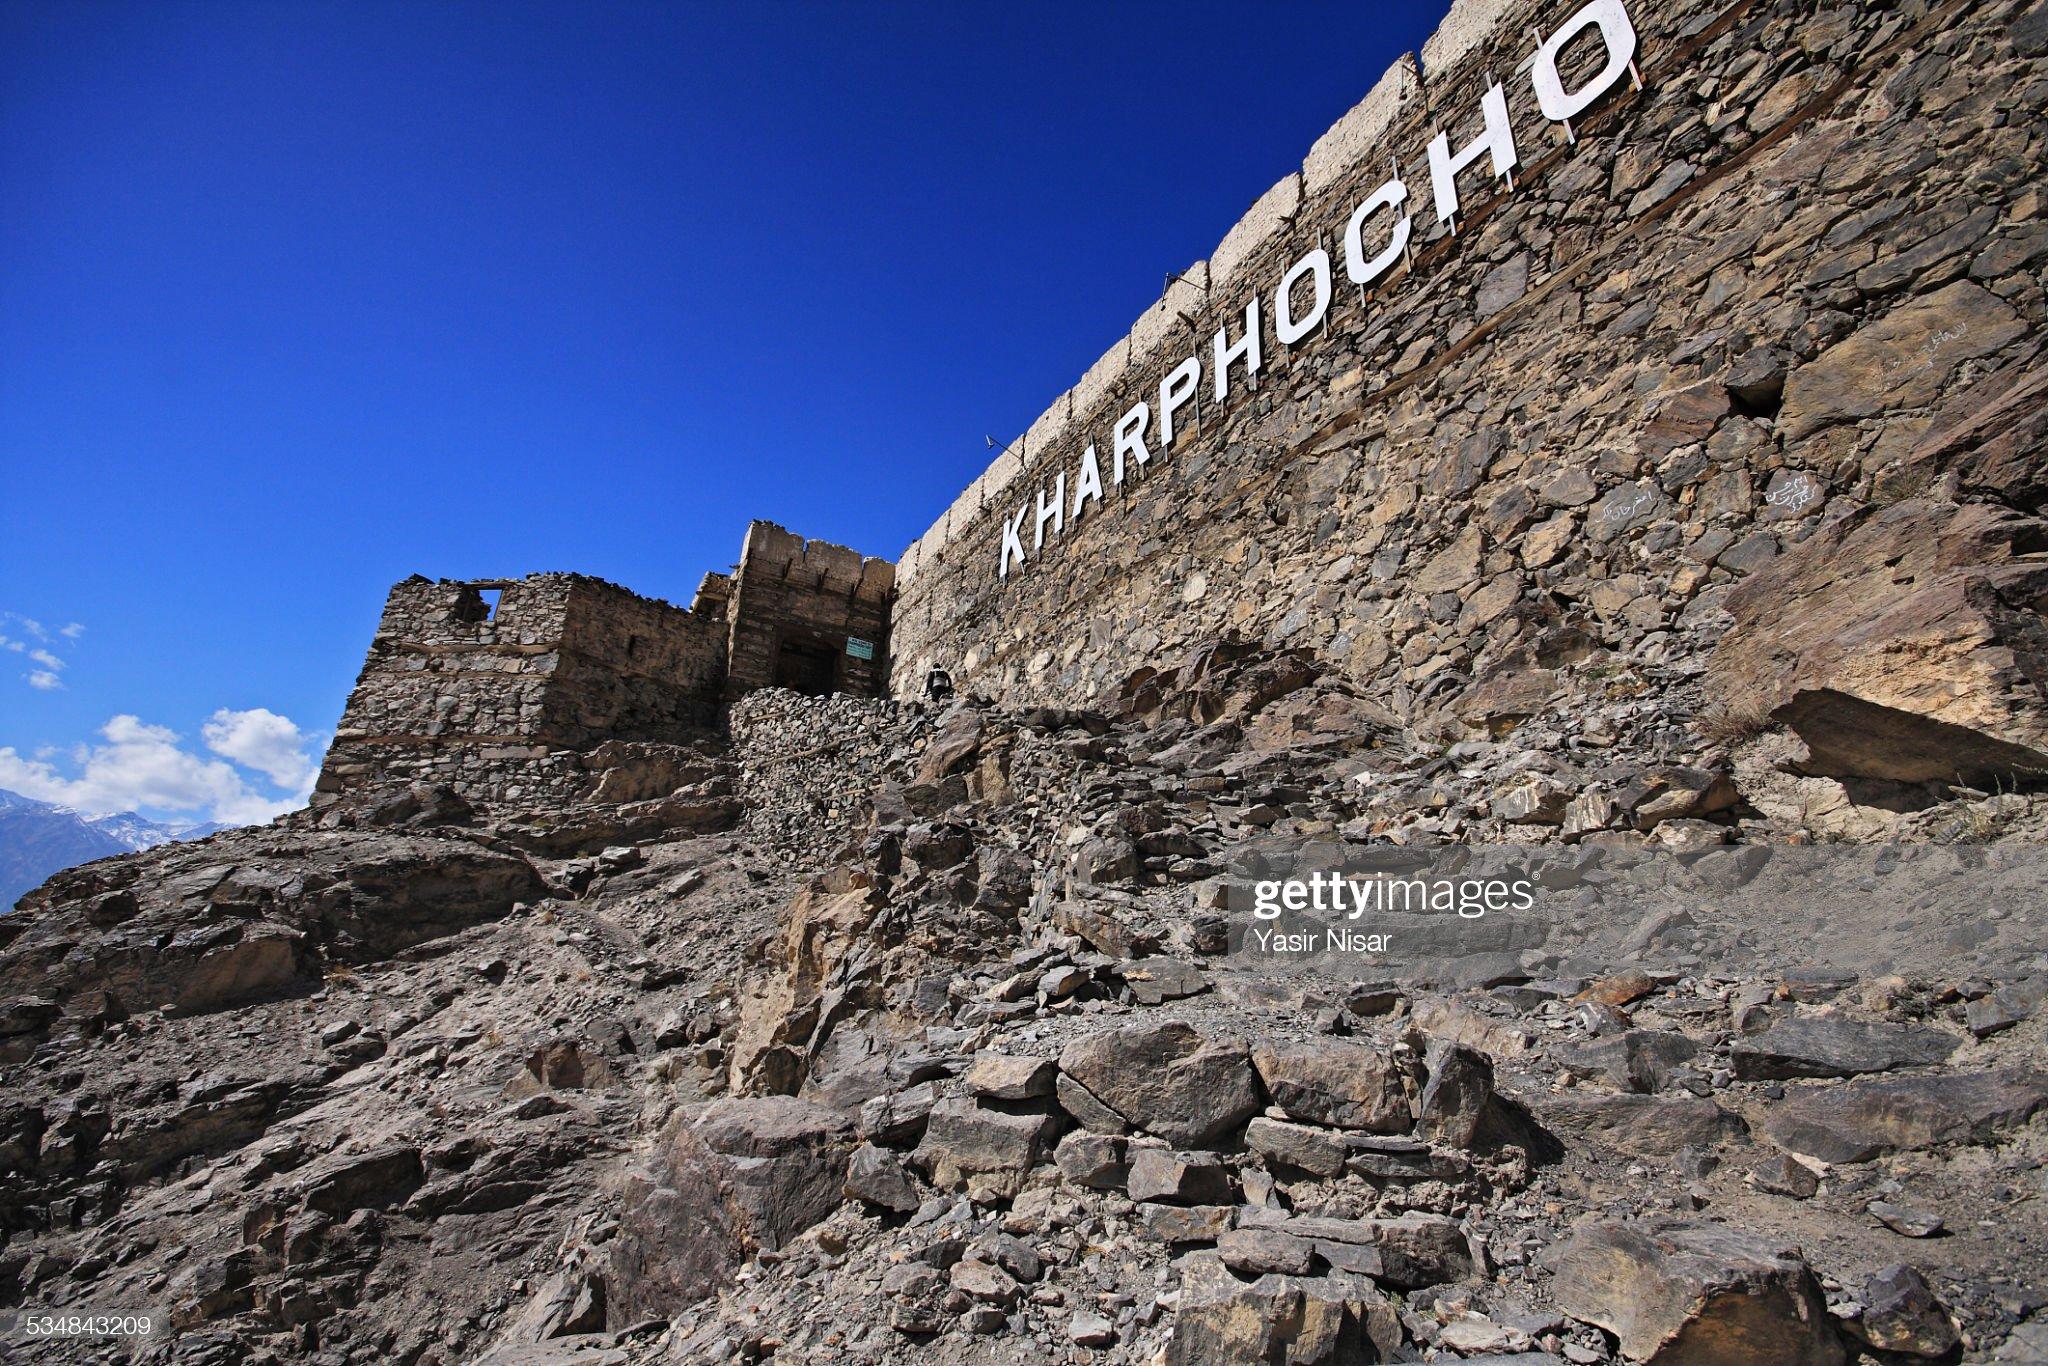 Kharpocho Fort Skardu, Gilgit-Baltistan. Forts in Gilgit-Baltistan.